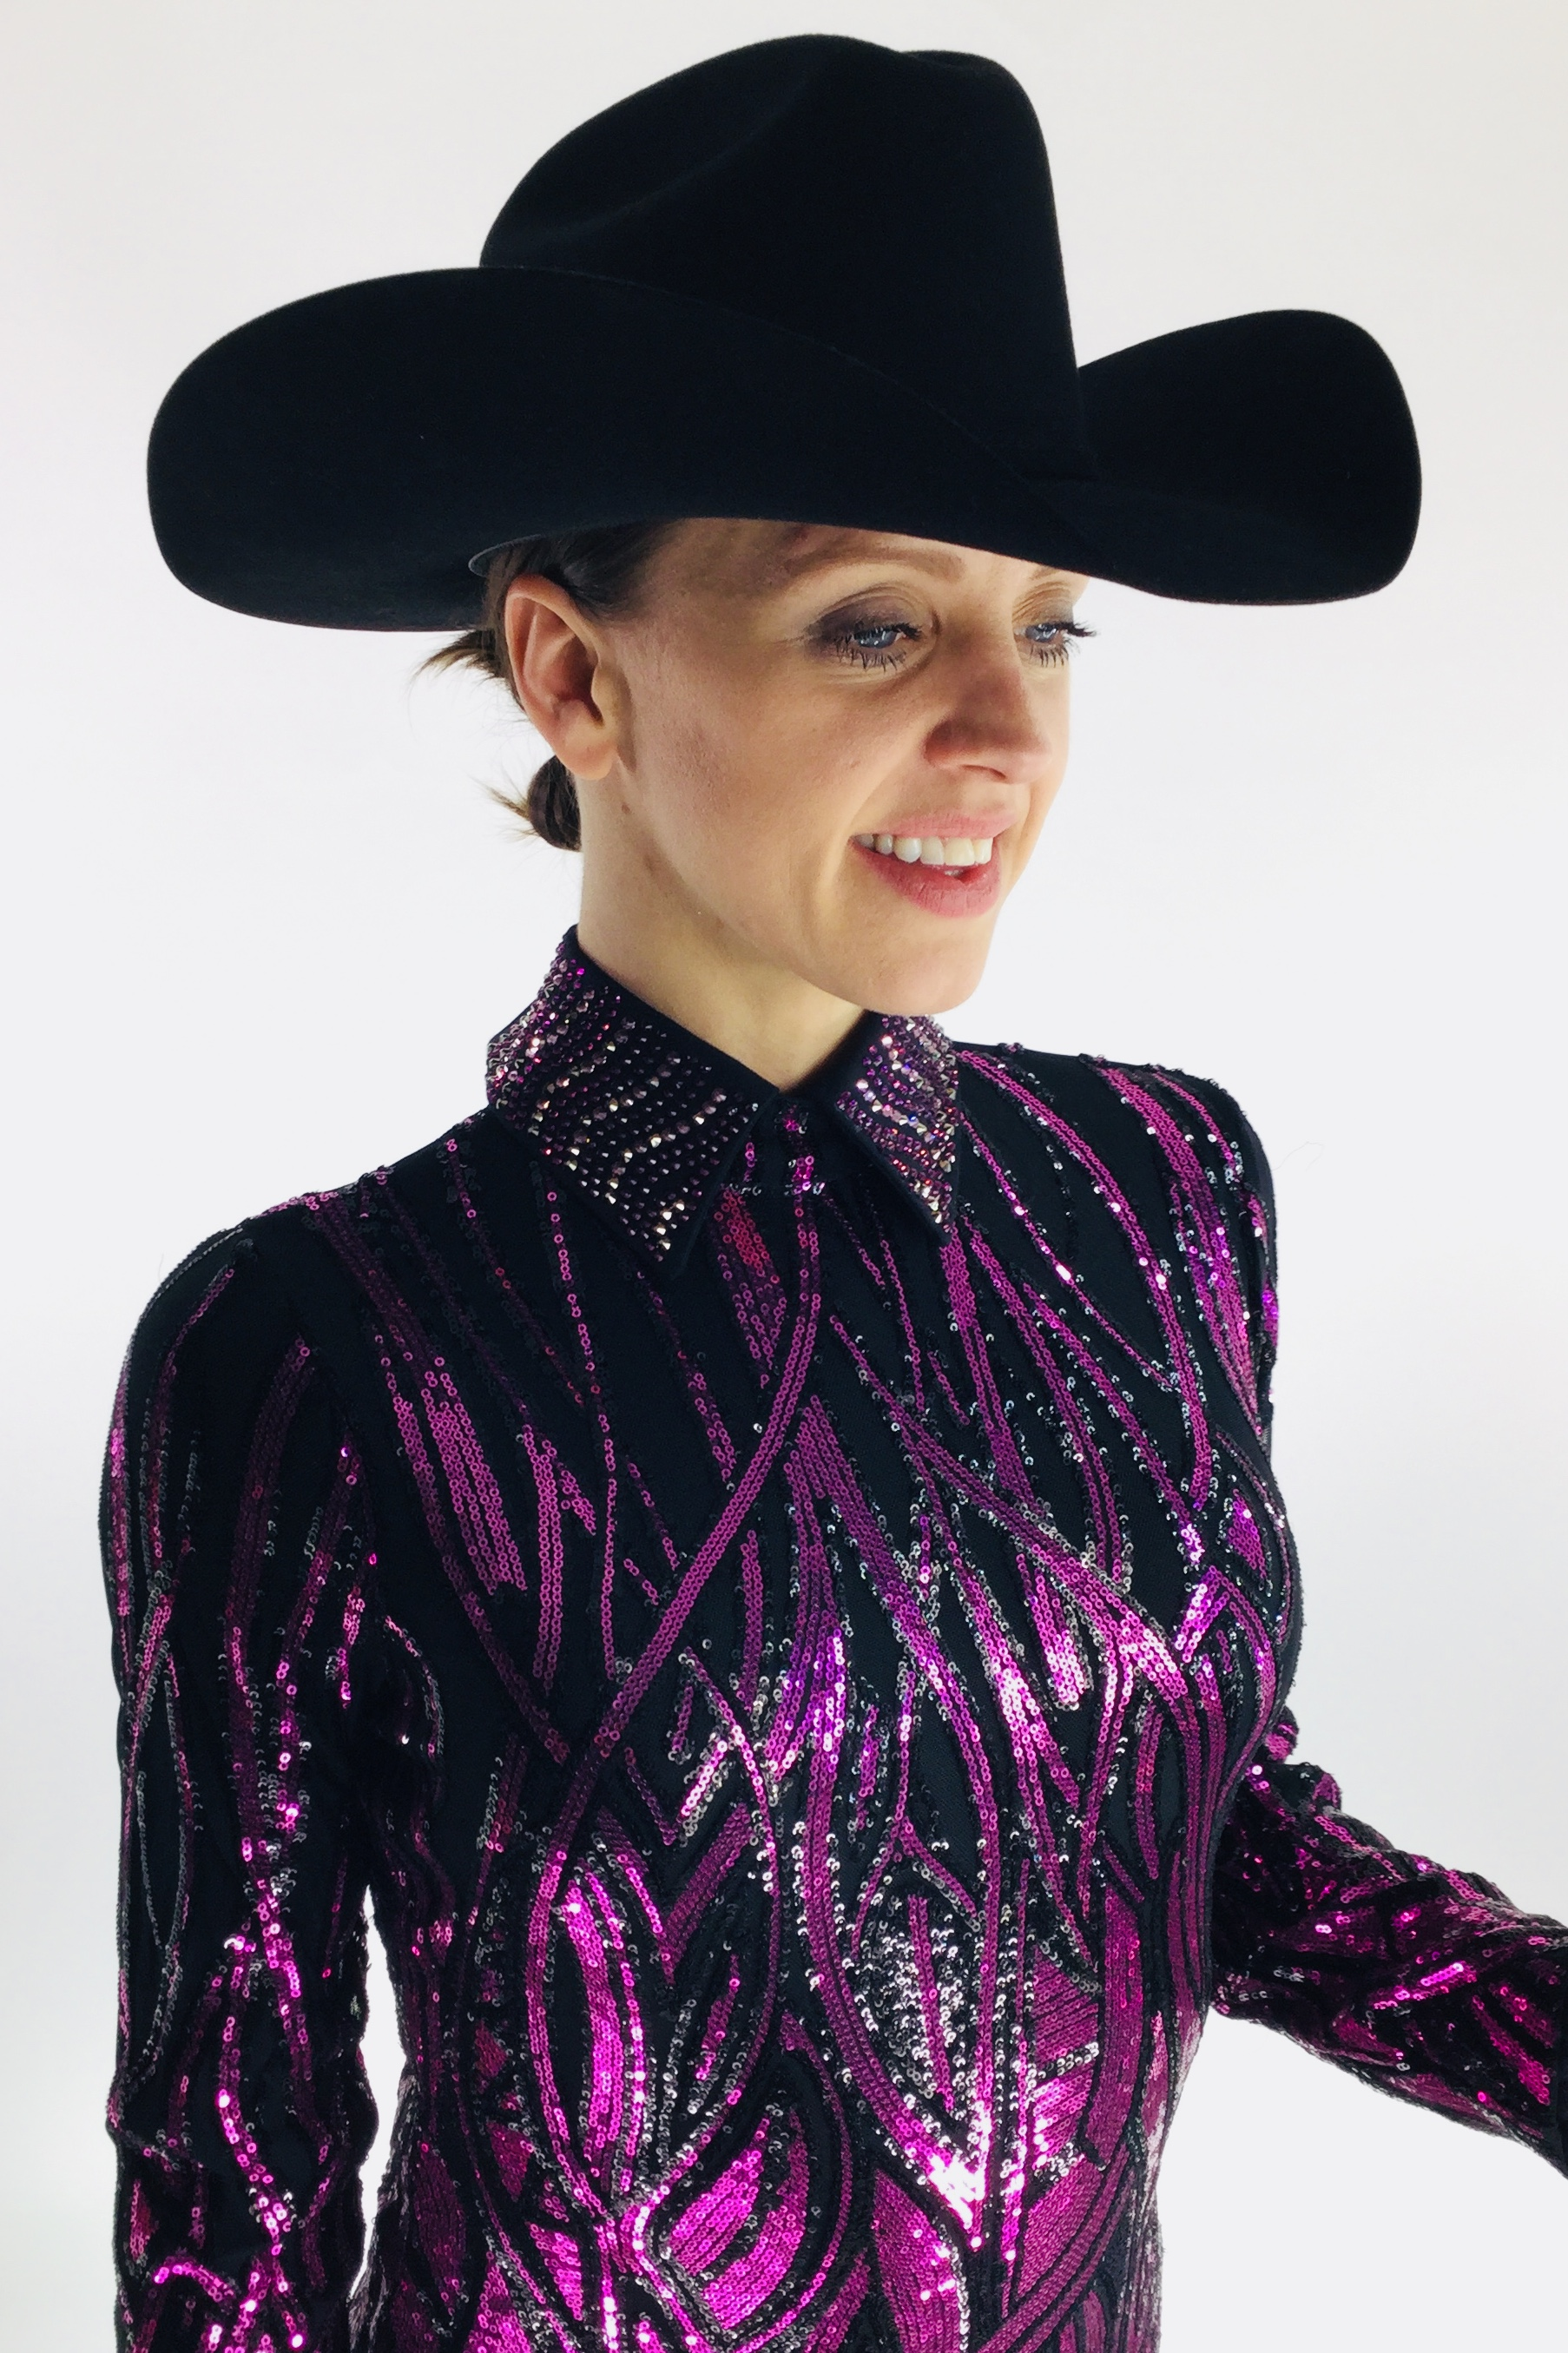 sparkle-ridge-black-and-purple-sequin-western-show-shirts-anita4.jpg